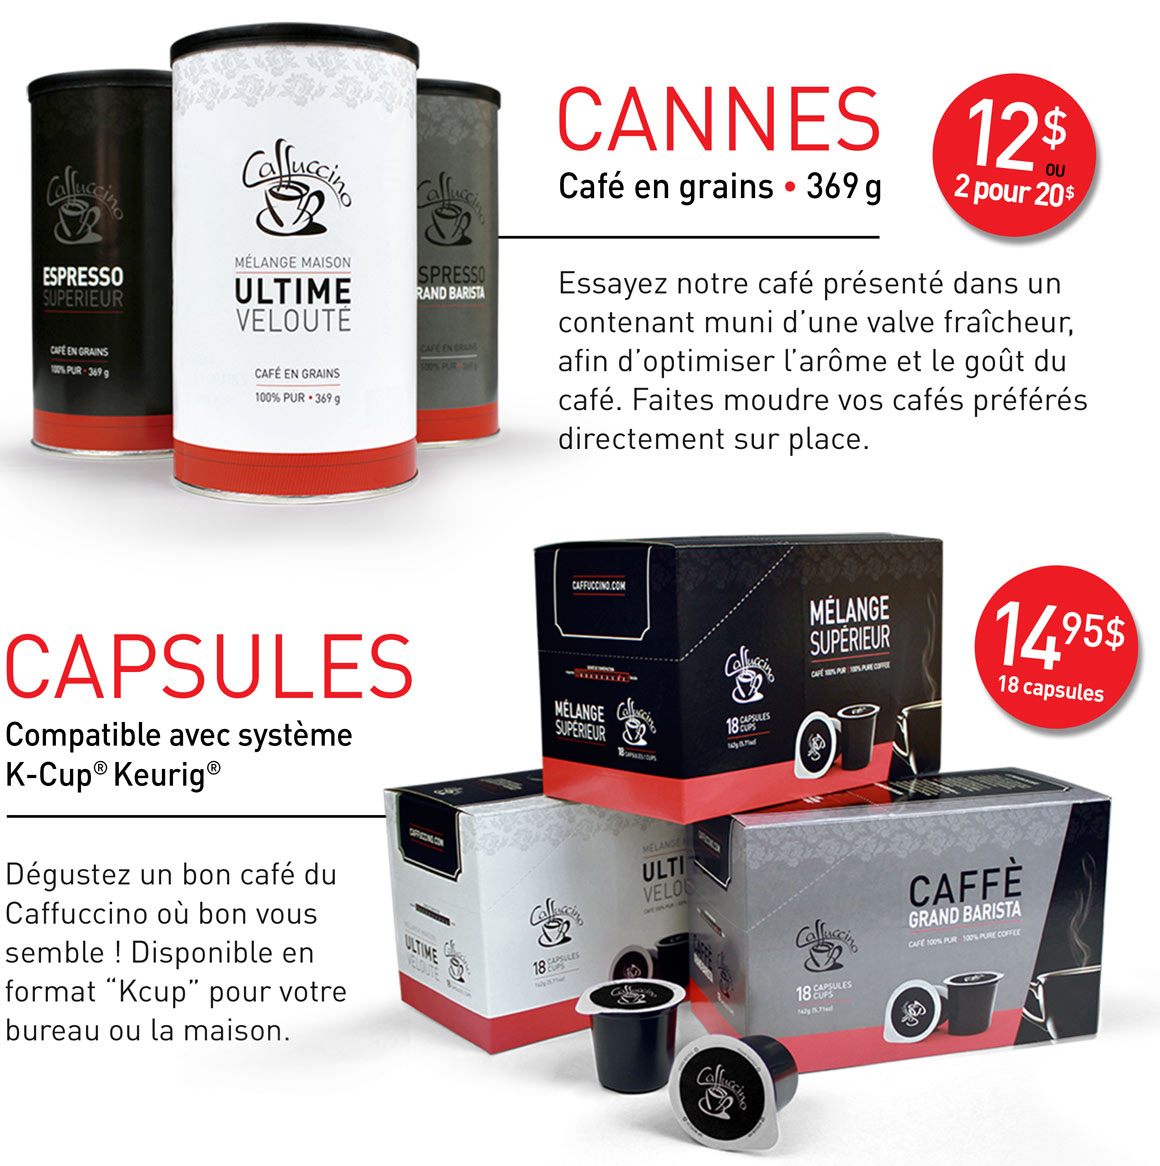 Collections de cafés - Caffuccino